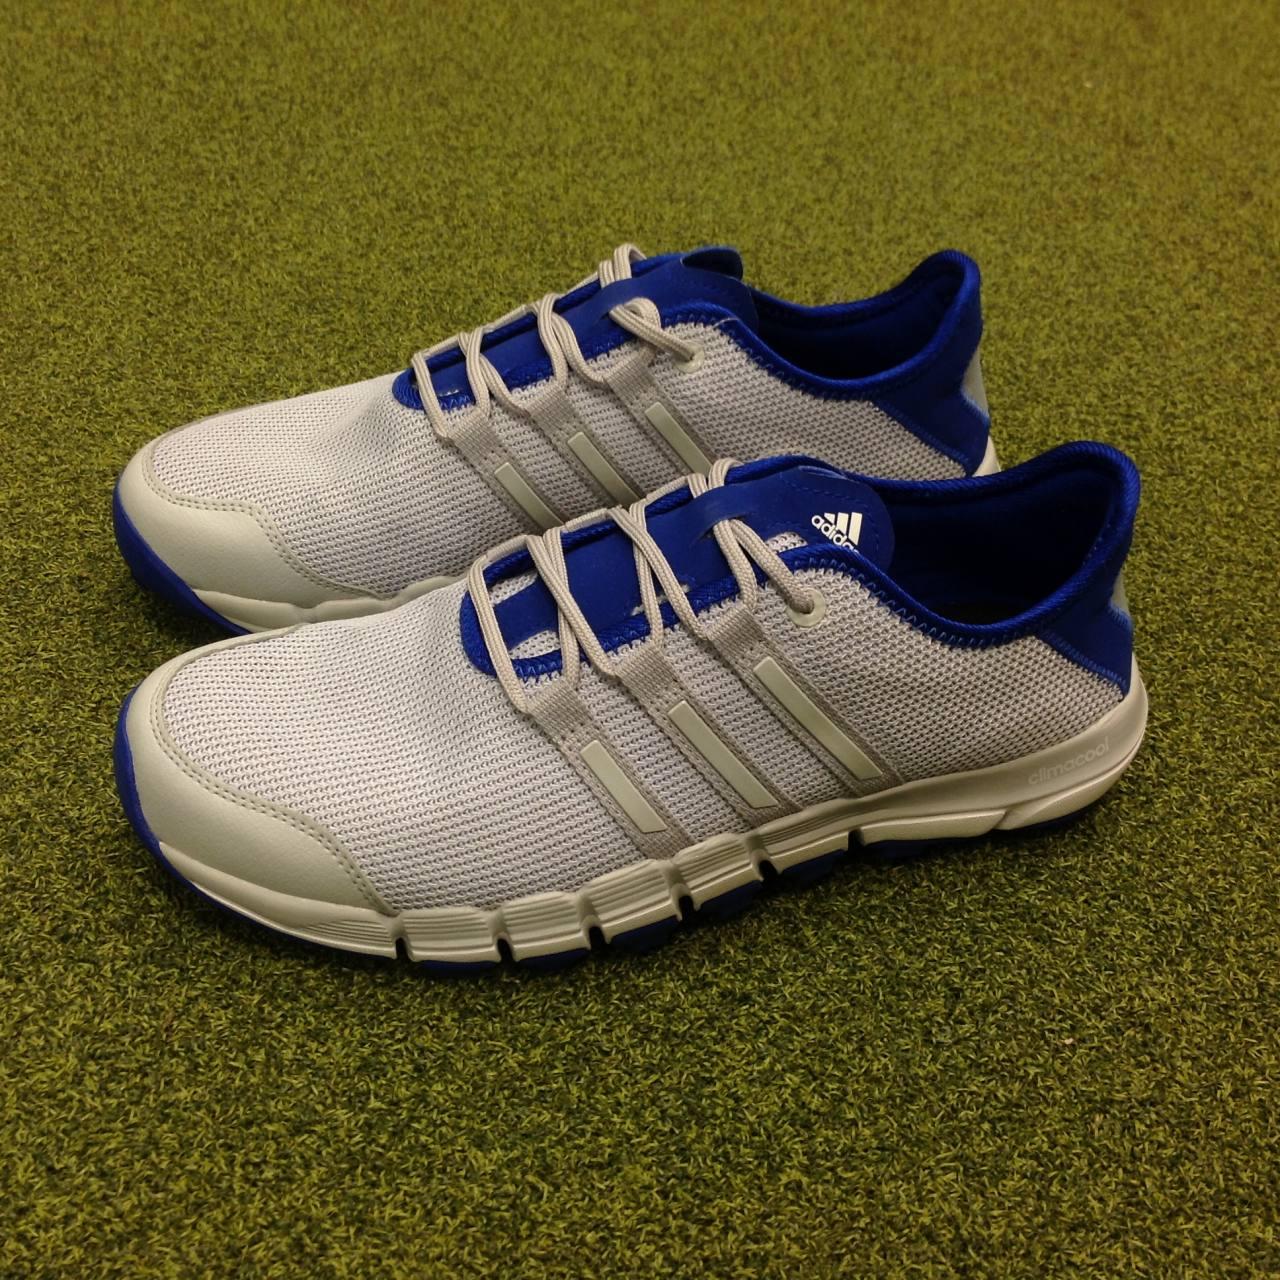 adidas golf climacool street shoes nz